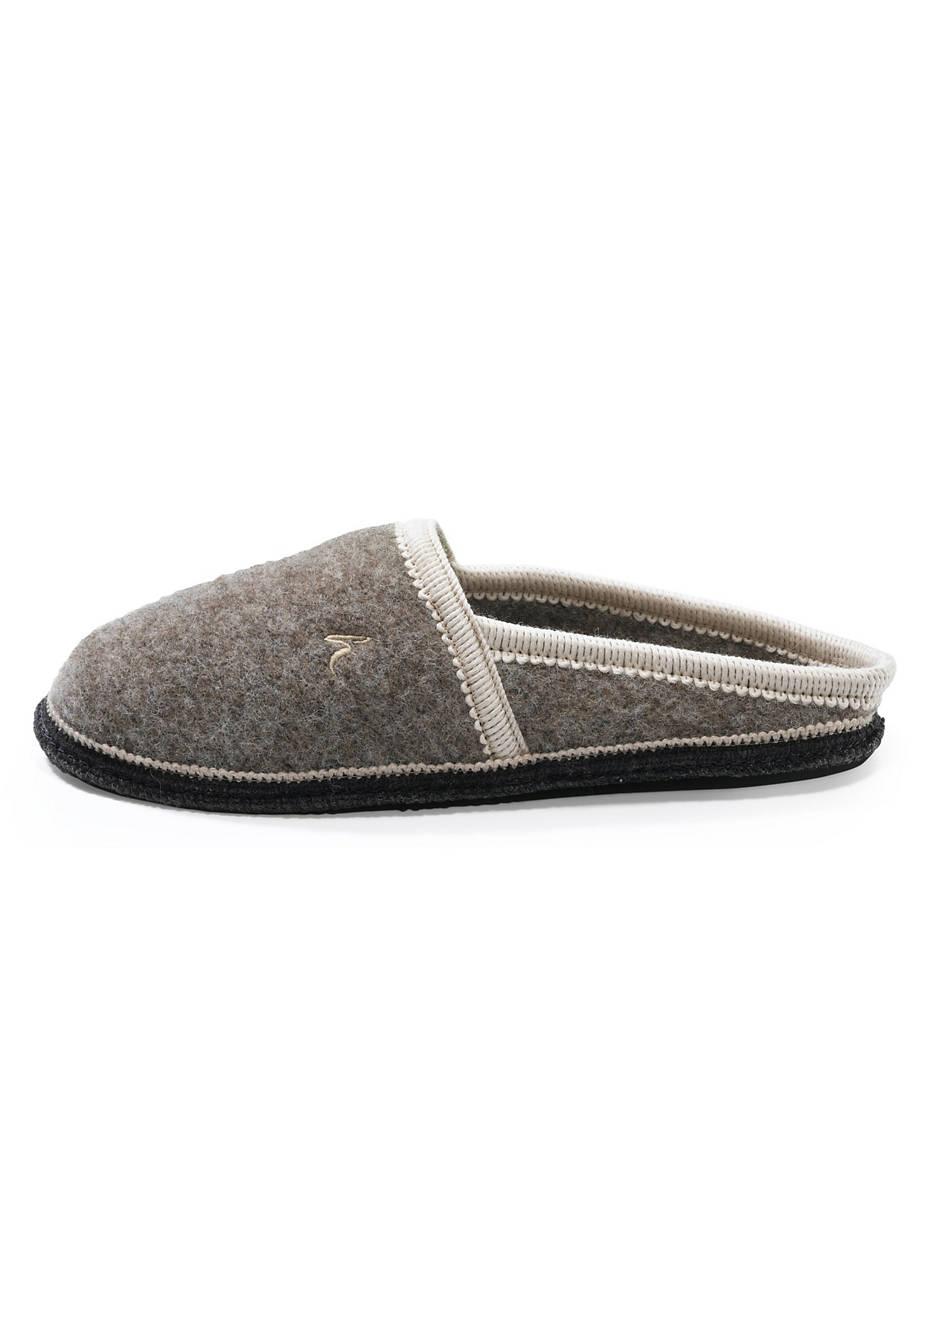 Rhön sheep felt slippers